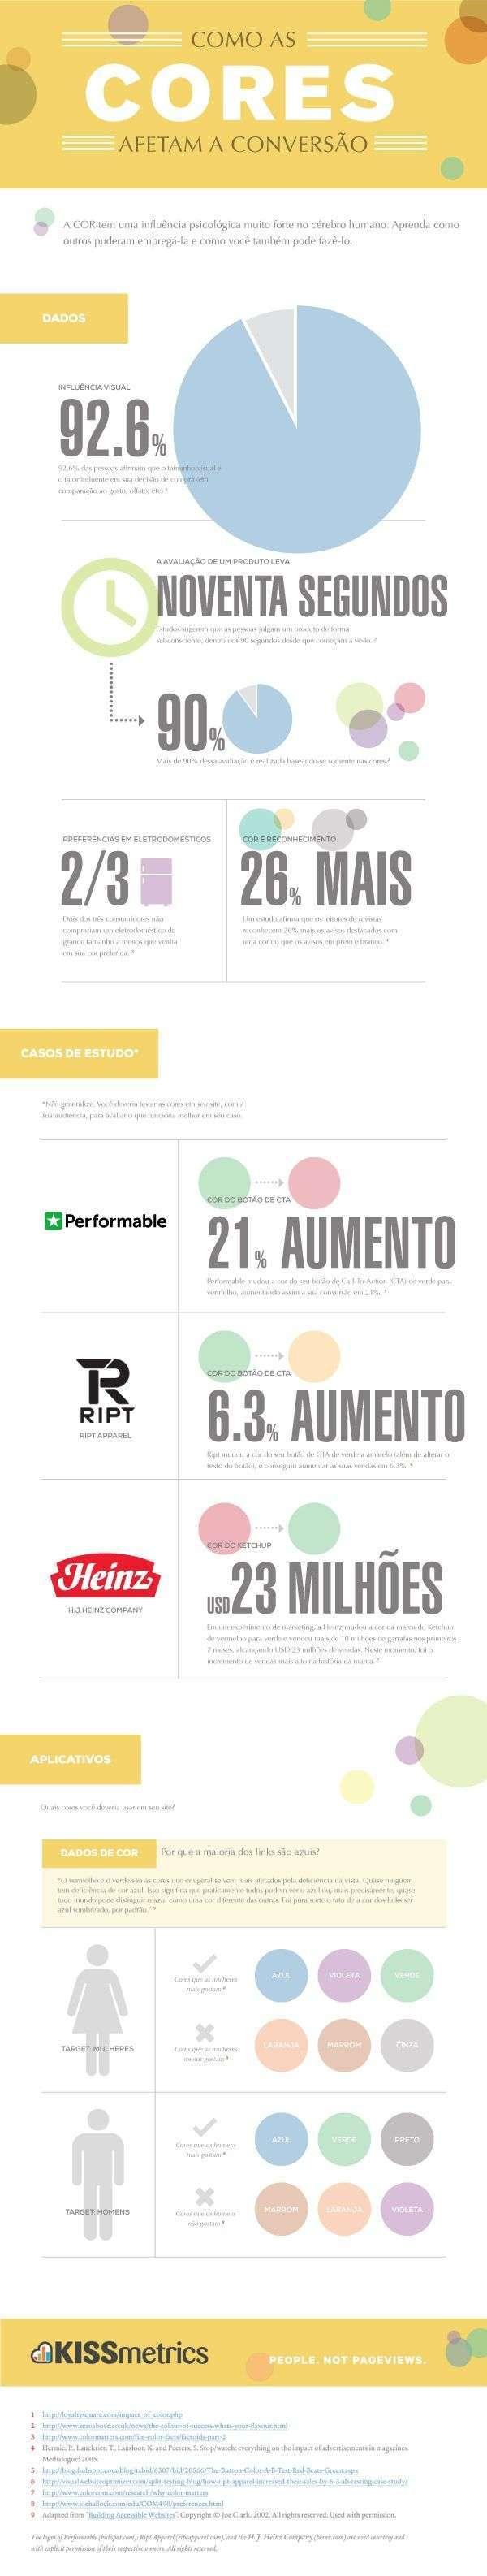 infográfico_cores_kissmetrics